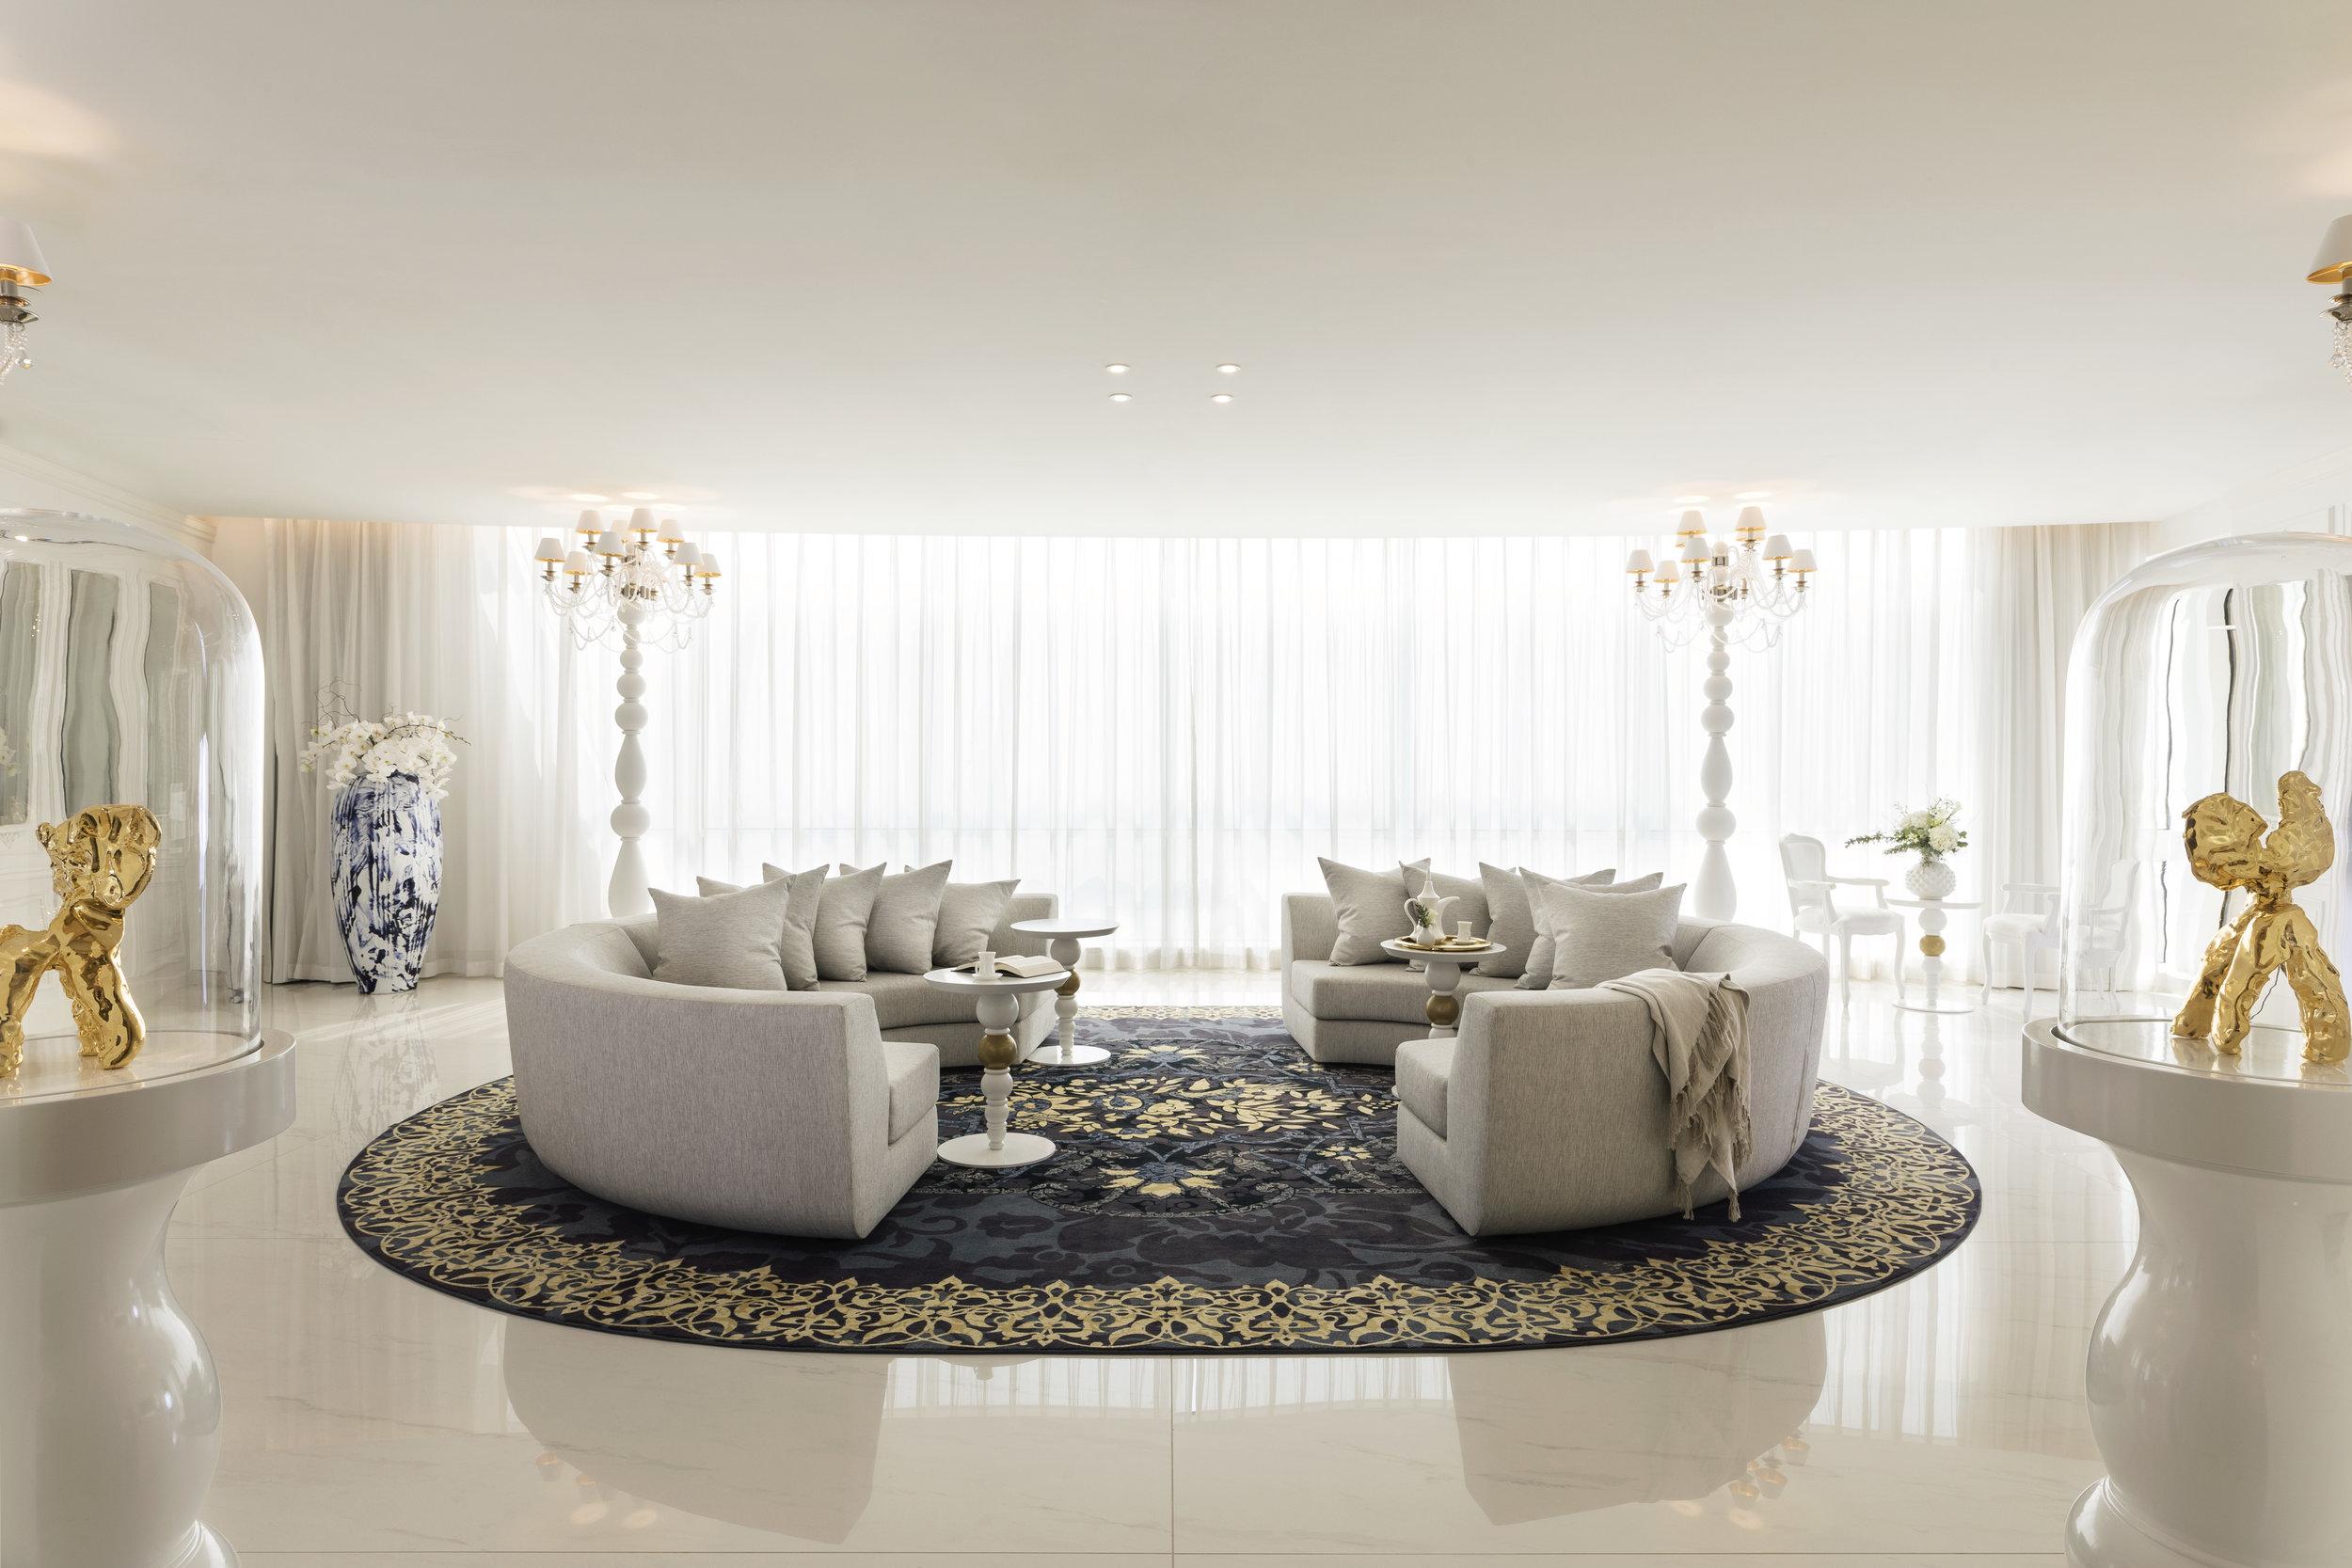 MW_MondrianDoha_Penthouse_04.jpg